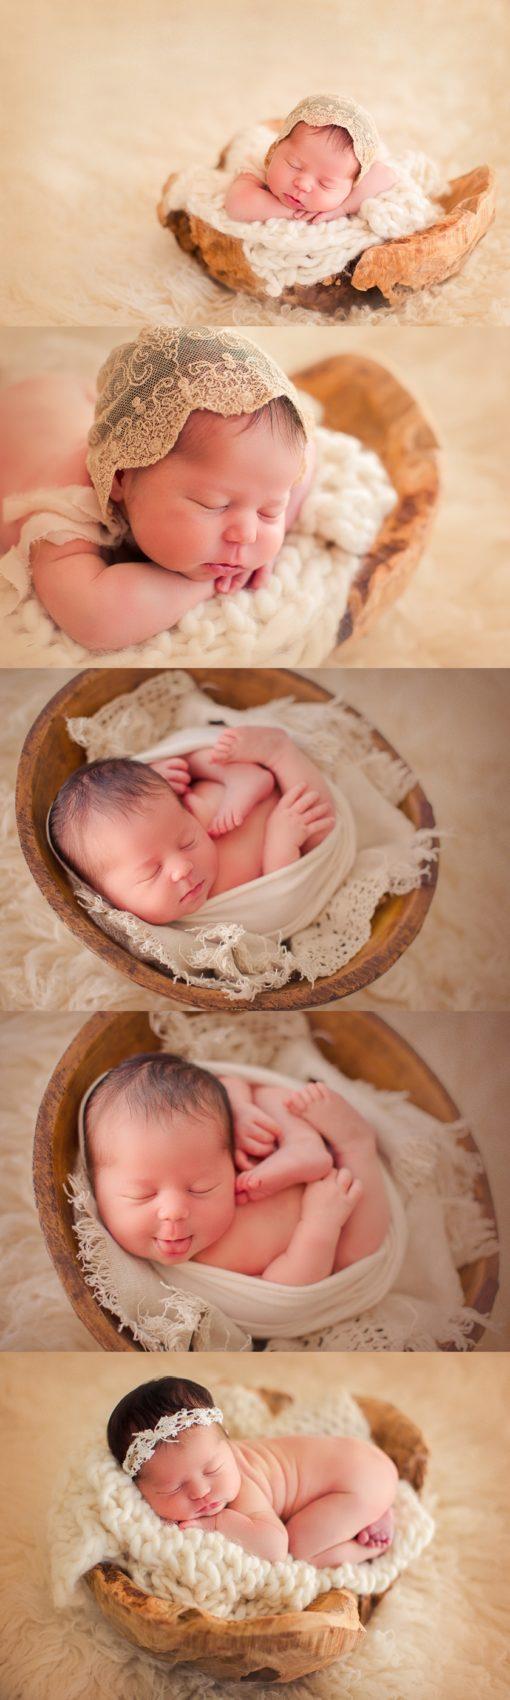 best newborn photography ideas DIY Best Newborn Photography Ideas